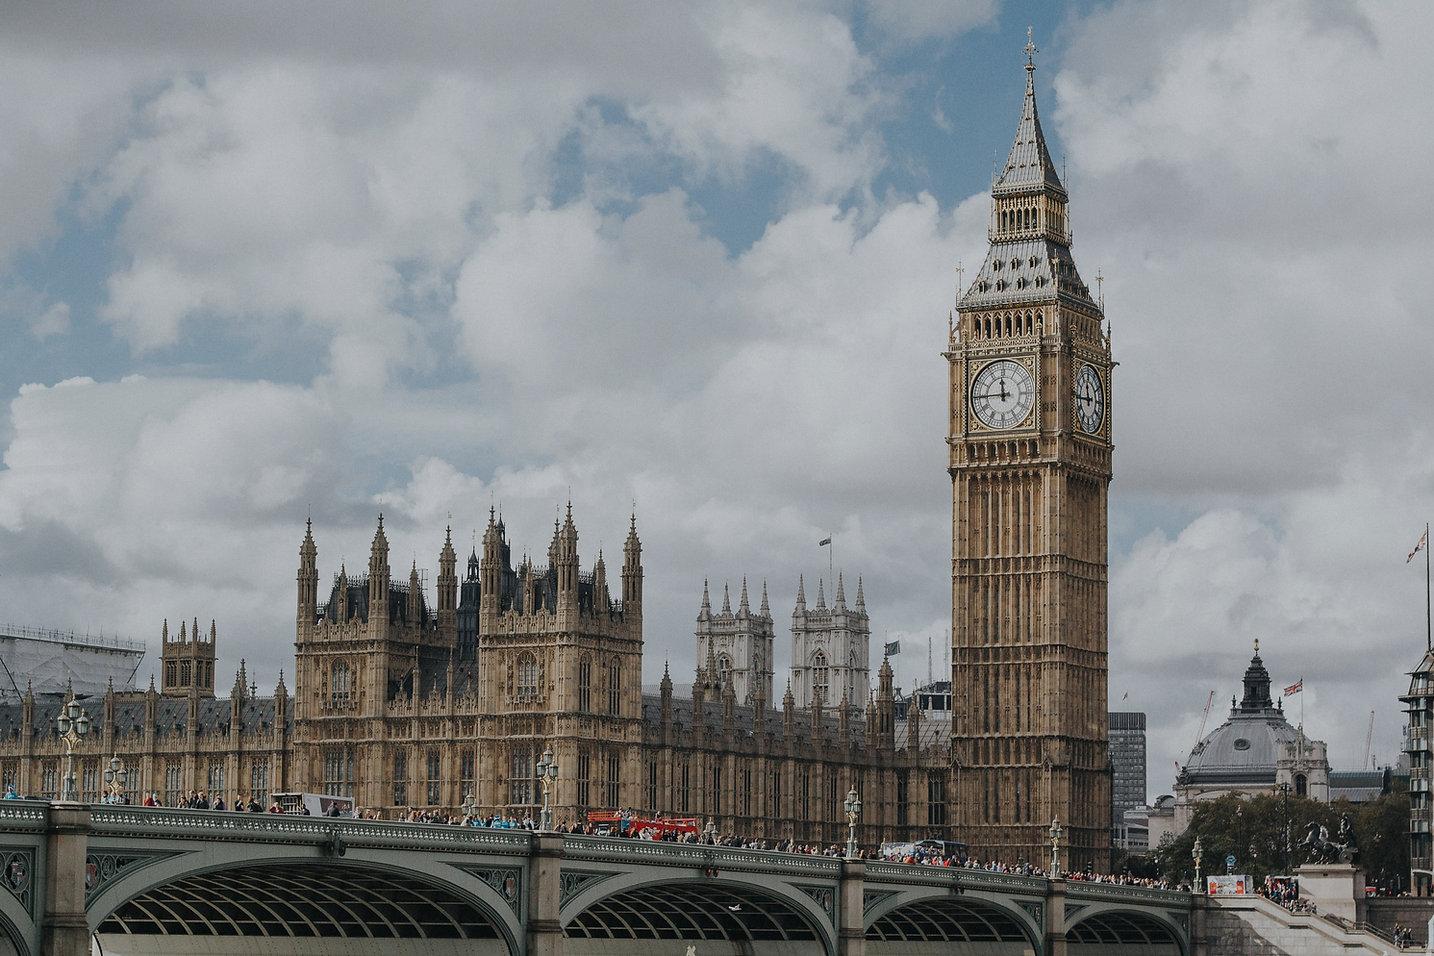 Parliament%20and%20Big%20Ben_edited.jpg